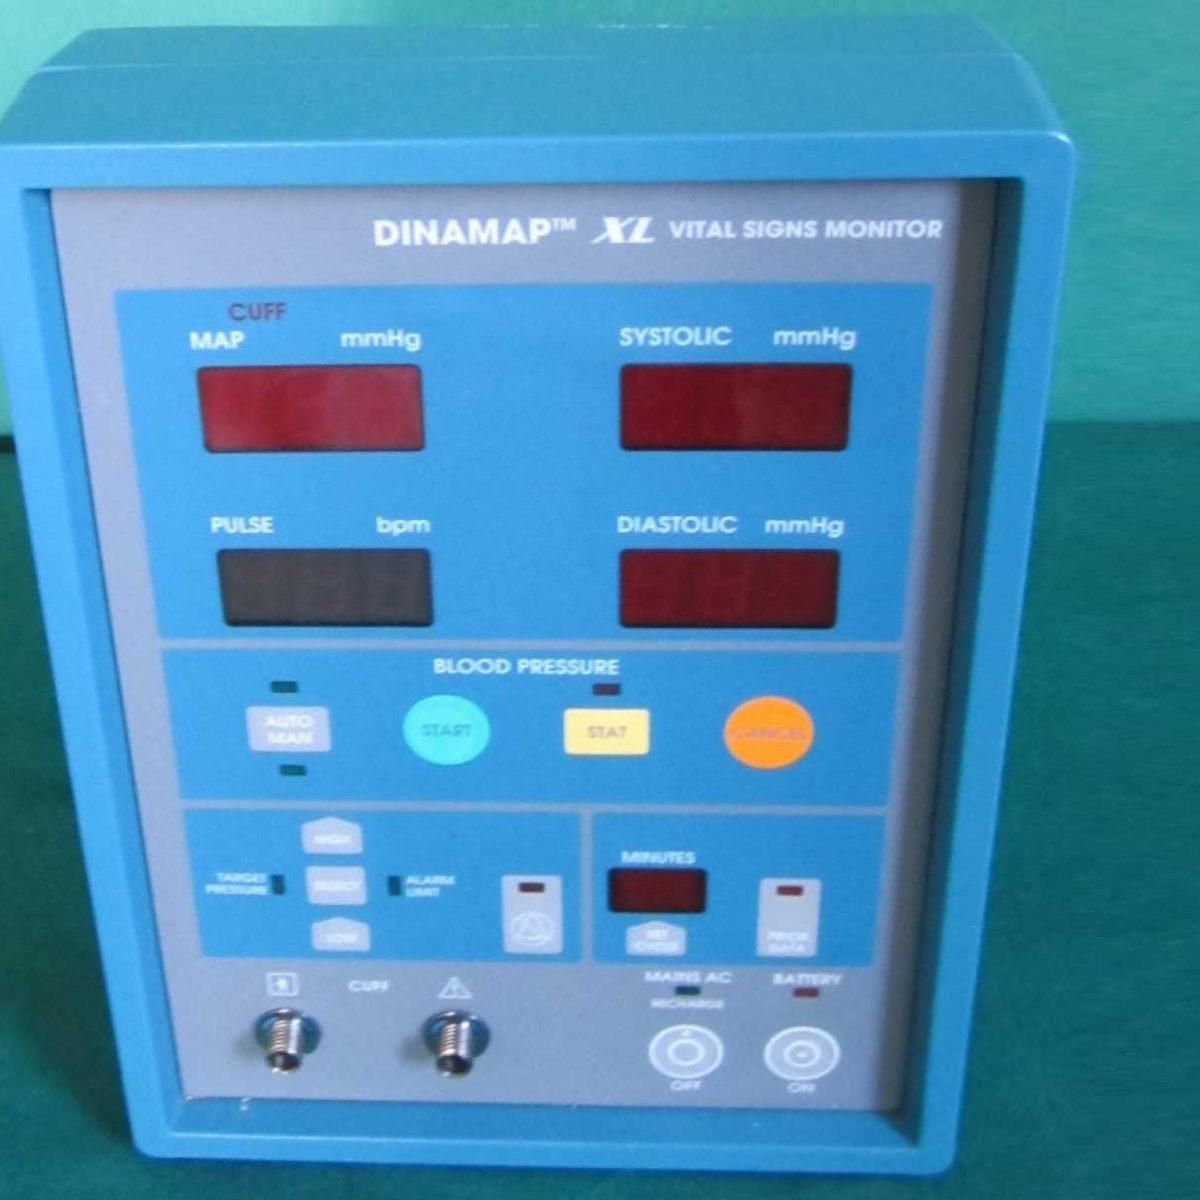 CRITIKON Dinamap XL blood pressure measurement device incl. pulse display, on